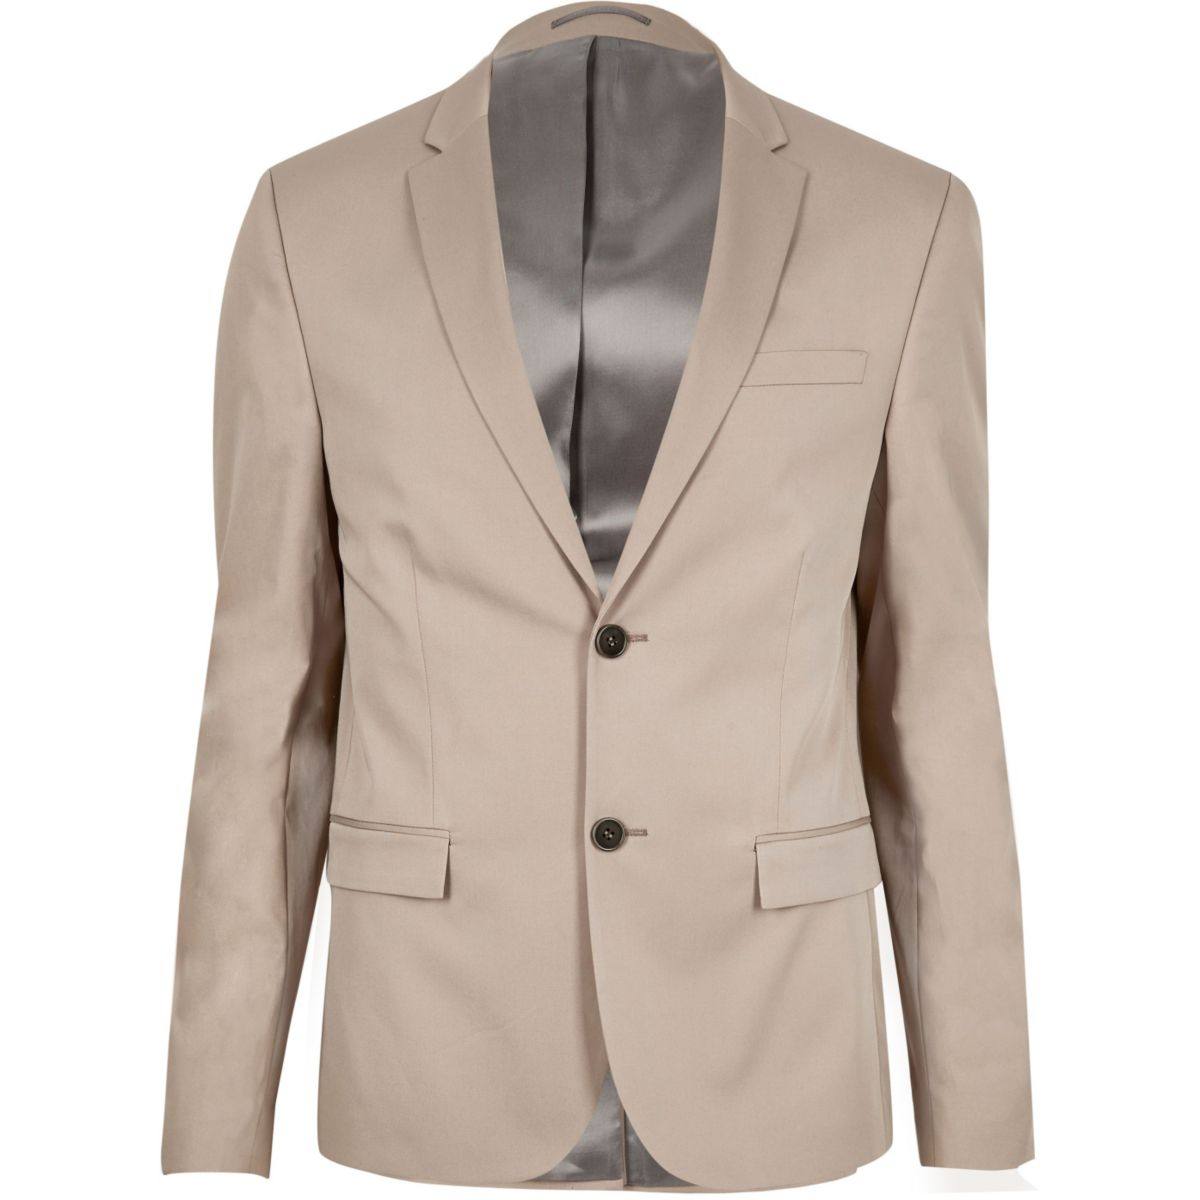 Veste de costume courte écrue coupe skinny